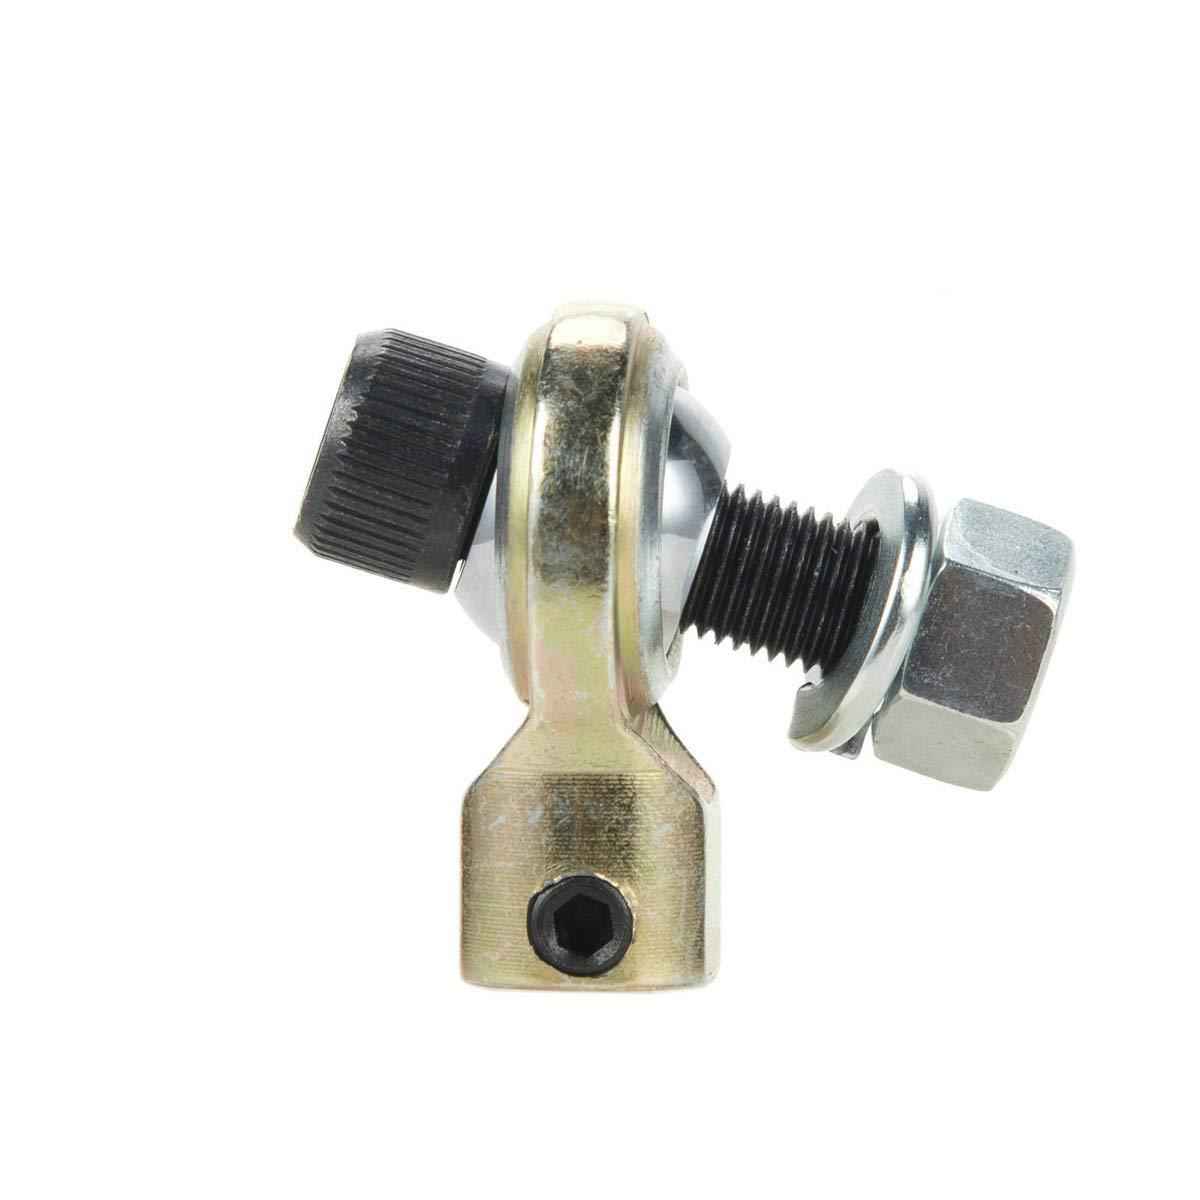 Coolingcare Clutch Rod Permanent Fix//Repair for 1987-2010 Ford F150 F250 F350 F450 F550/&Bronco E